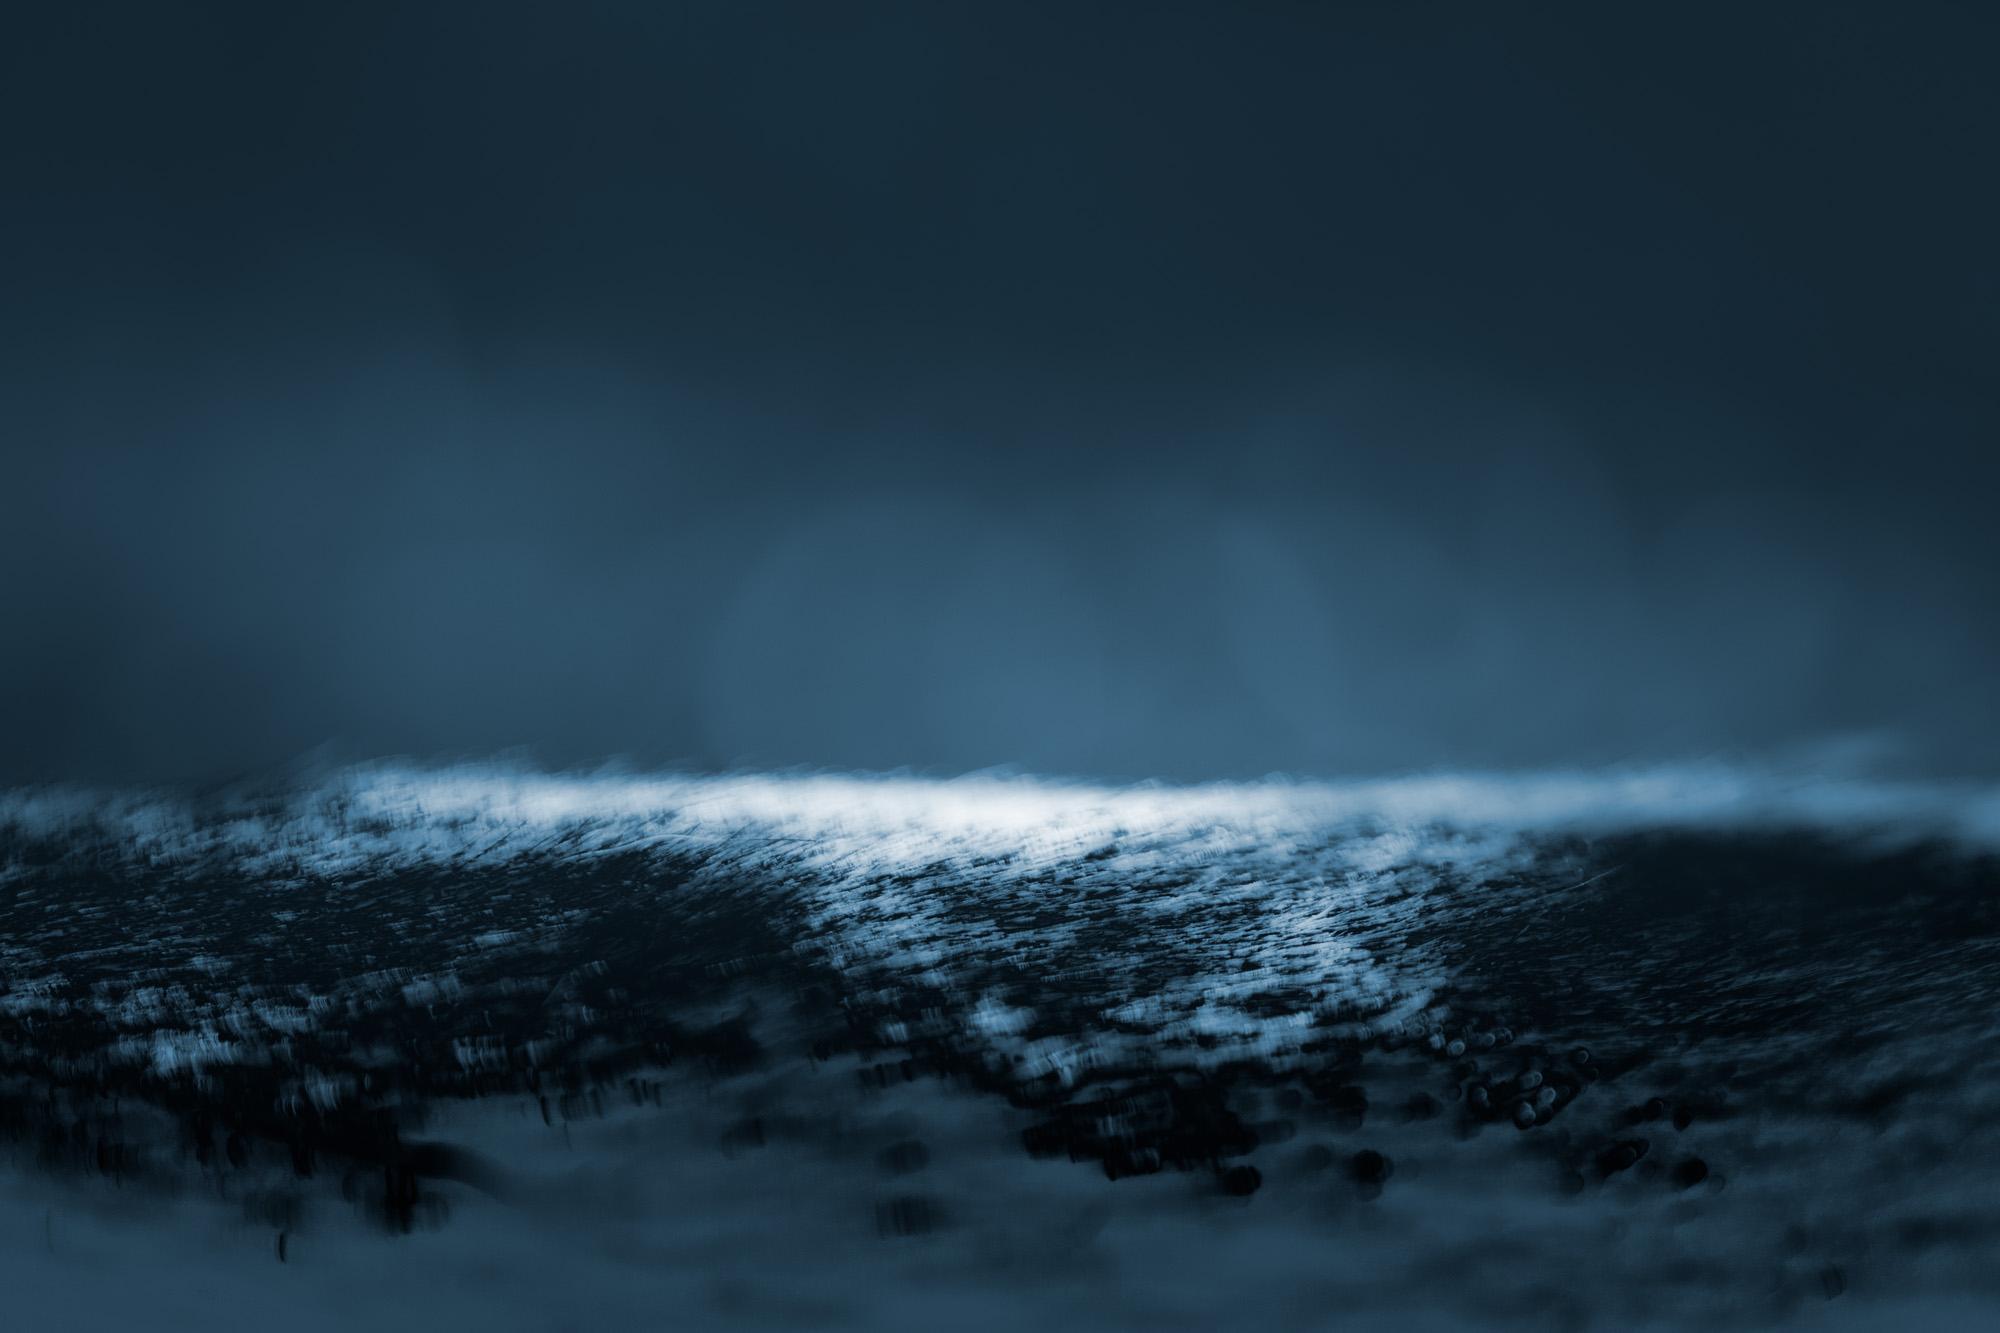 sea and moonlight